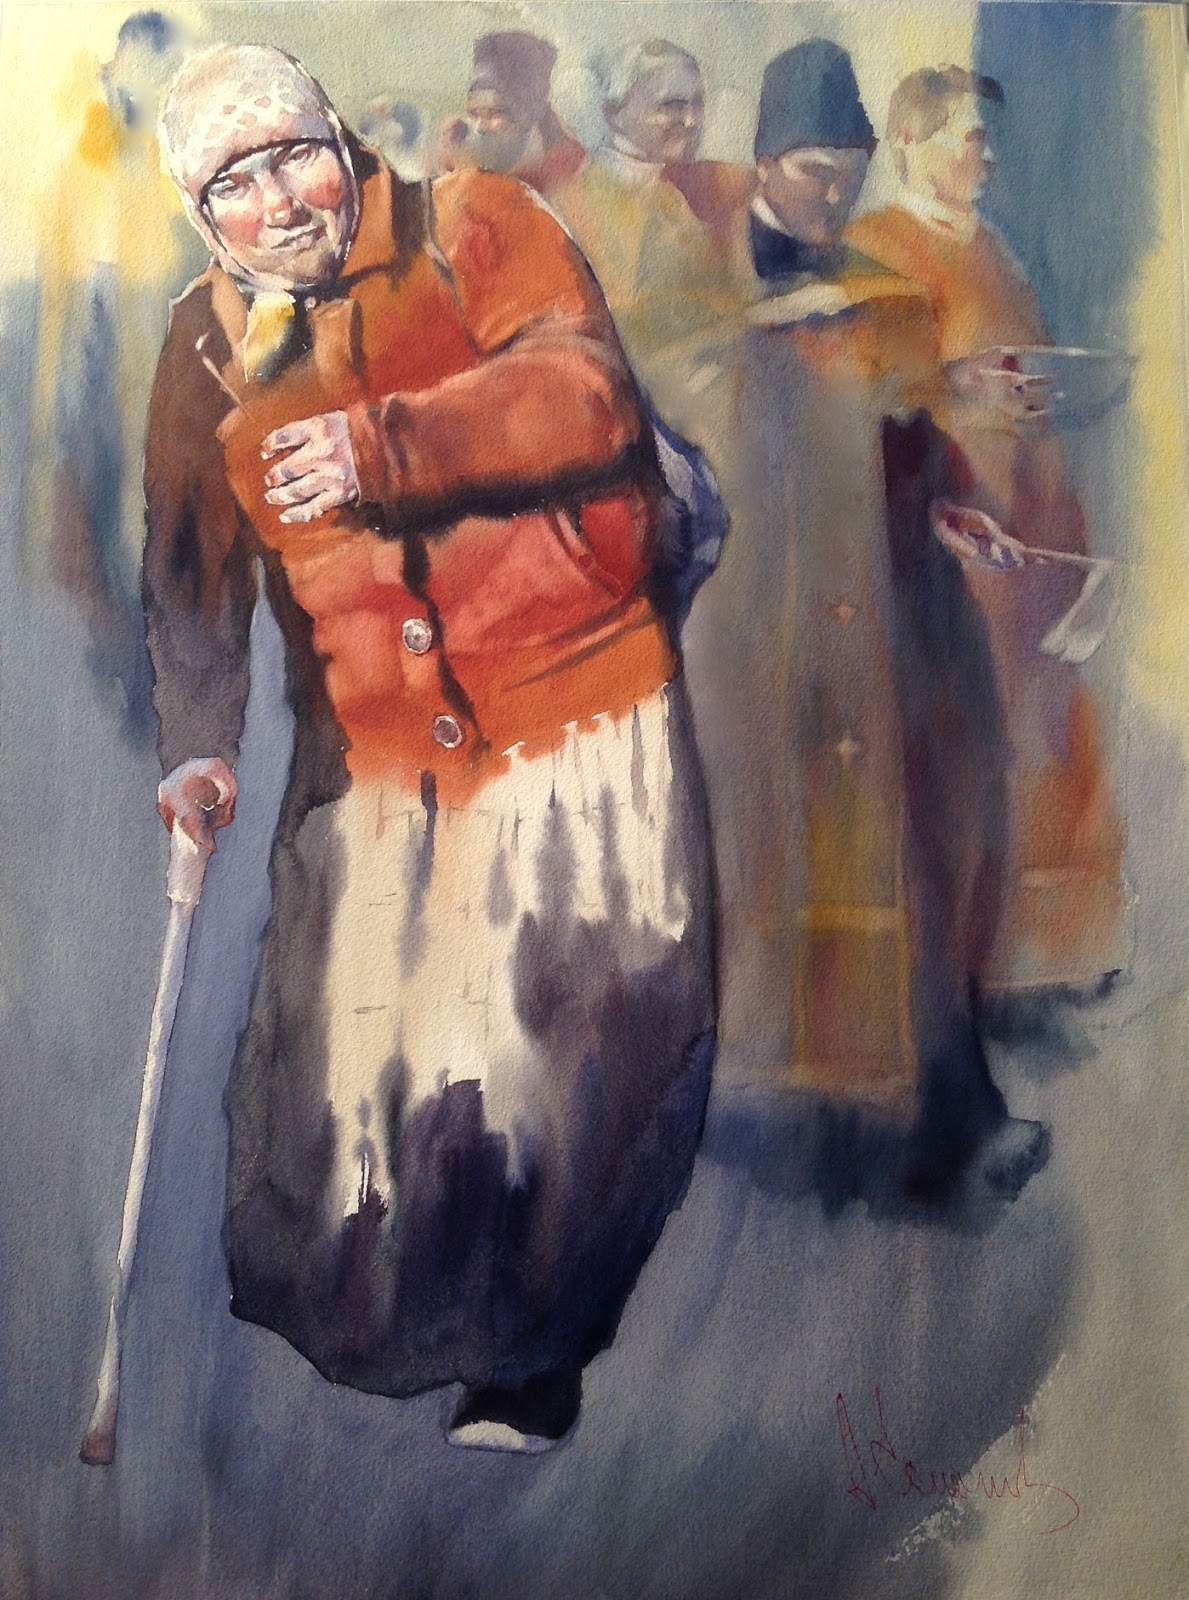 Andrey Esionov A Godly Woman